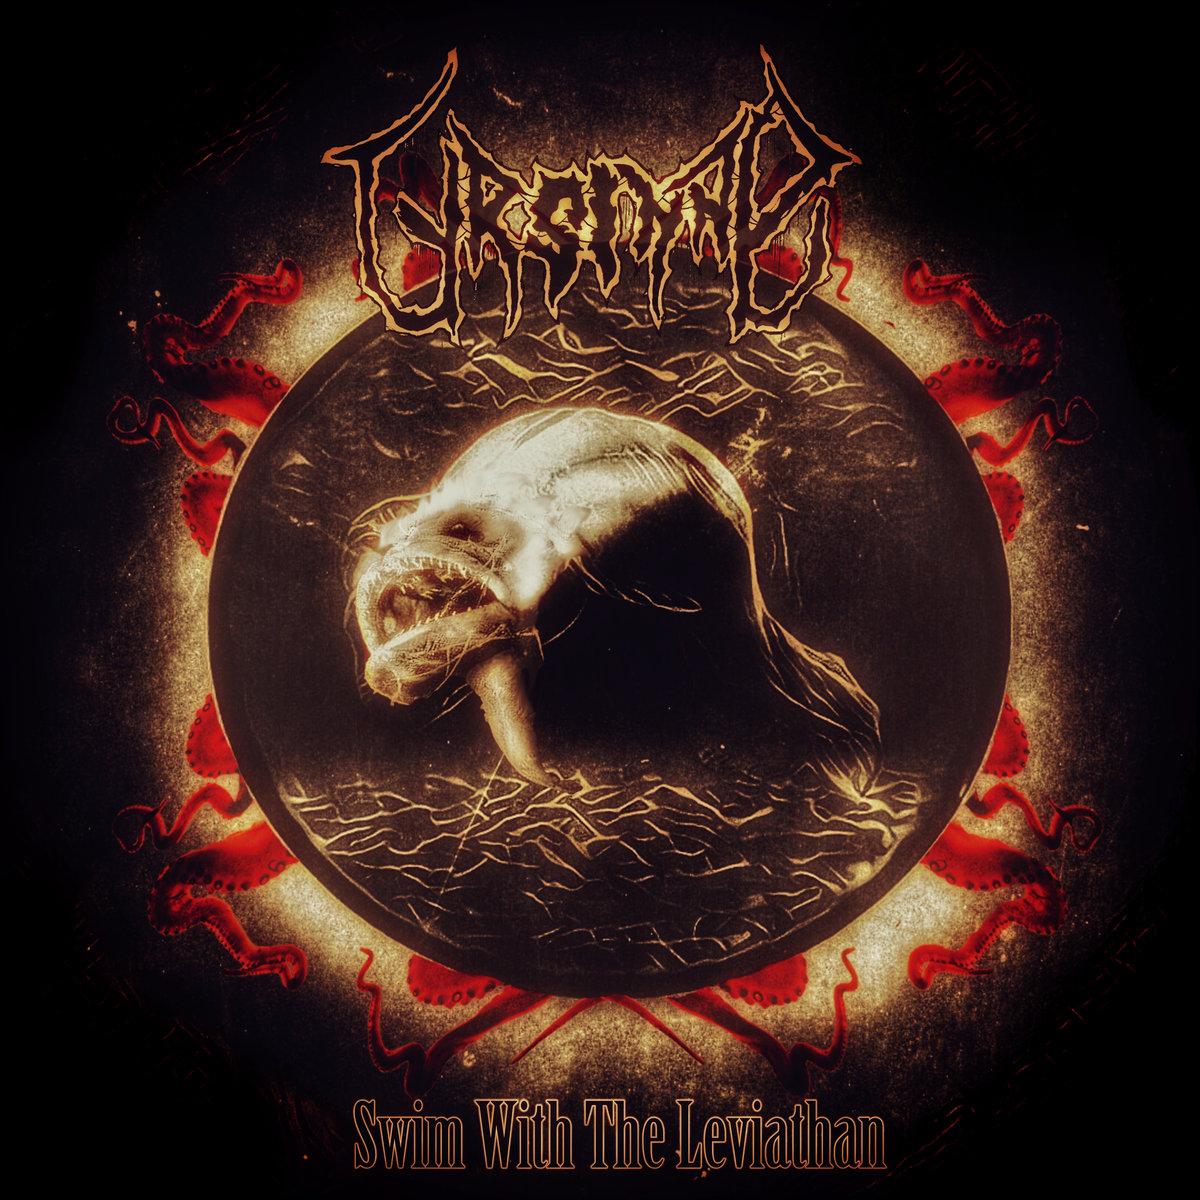 URSINNE – Swim With The Leviathan Album Review